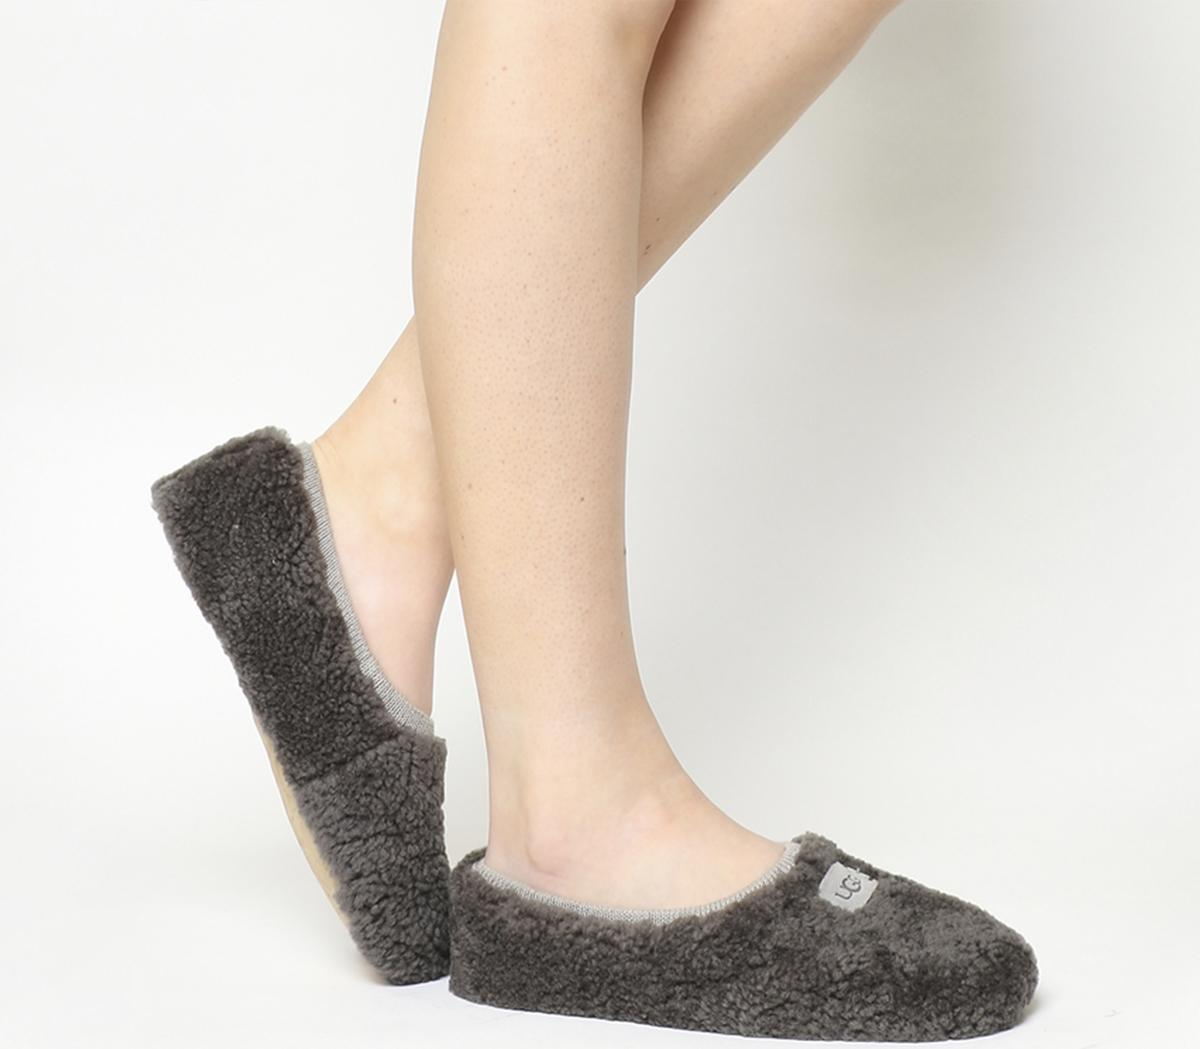 Persevering Genuine Pebble Leather Slip-on Black Shoes Size 7 Shapewear